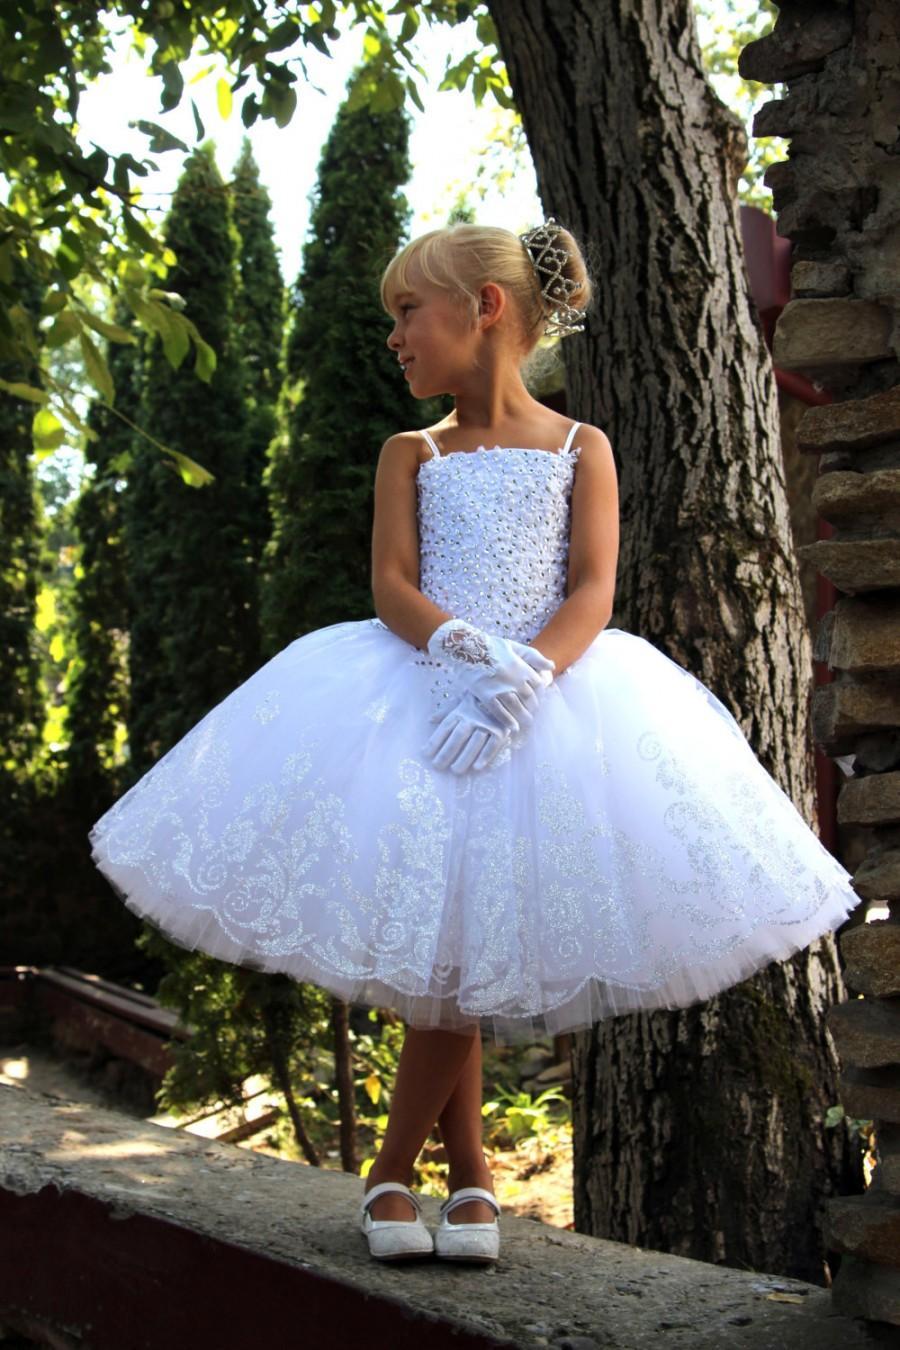 Свадьба - White Flower Girls Dress - Birthday Wedding Party Holiday Peasant Bridesmaid Tulle White Dress